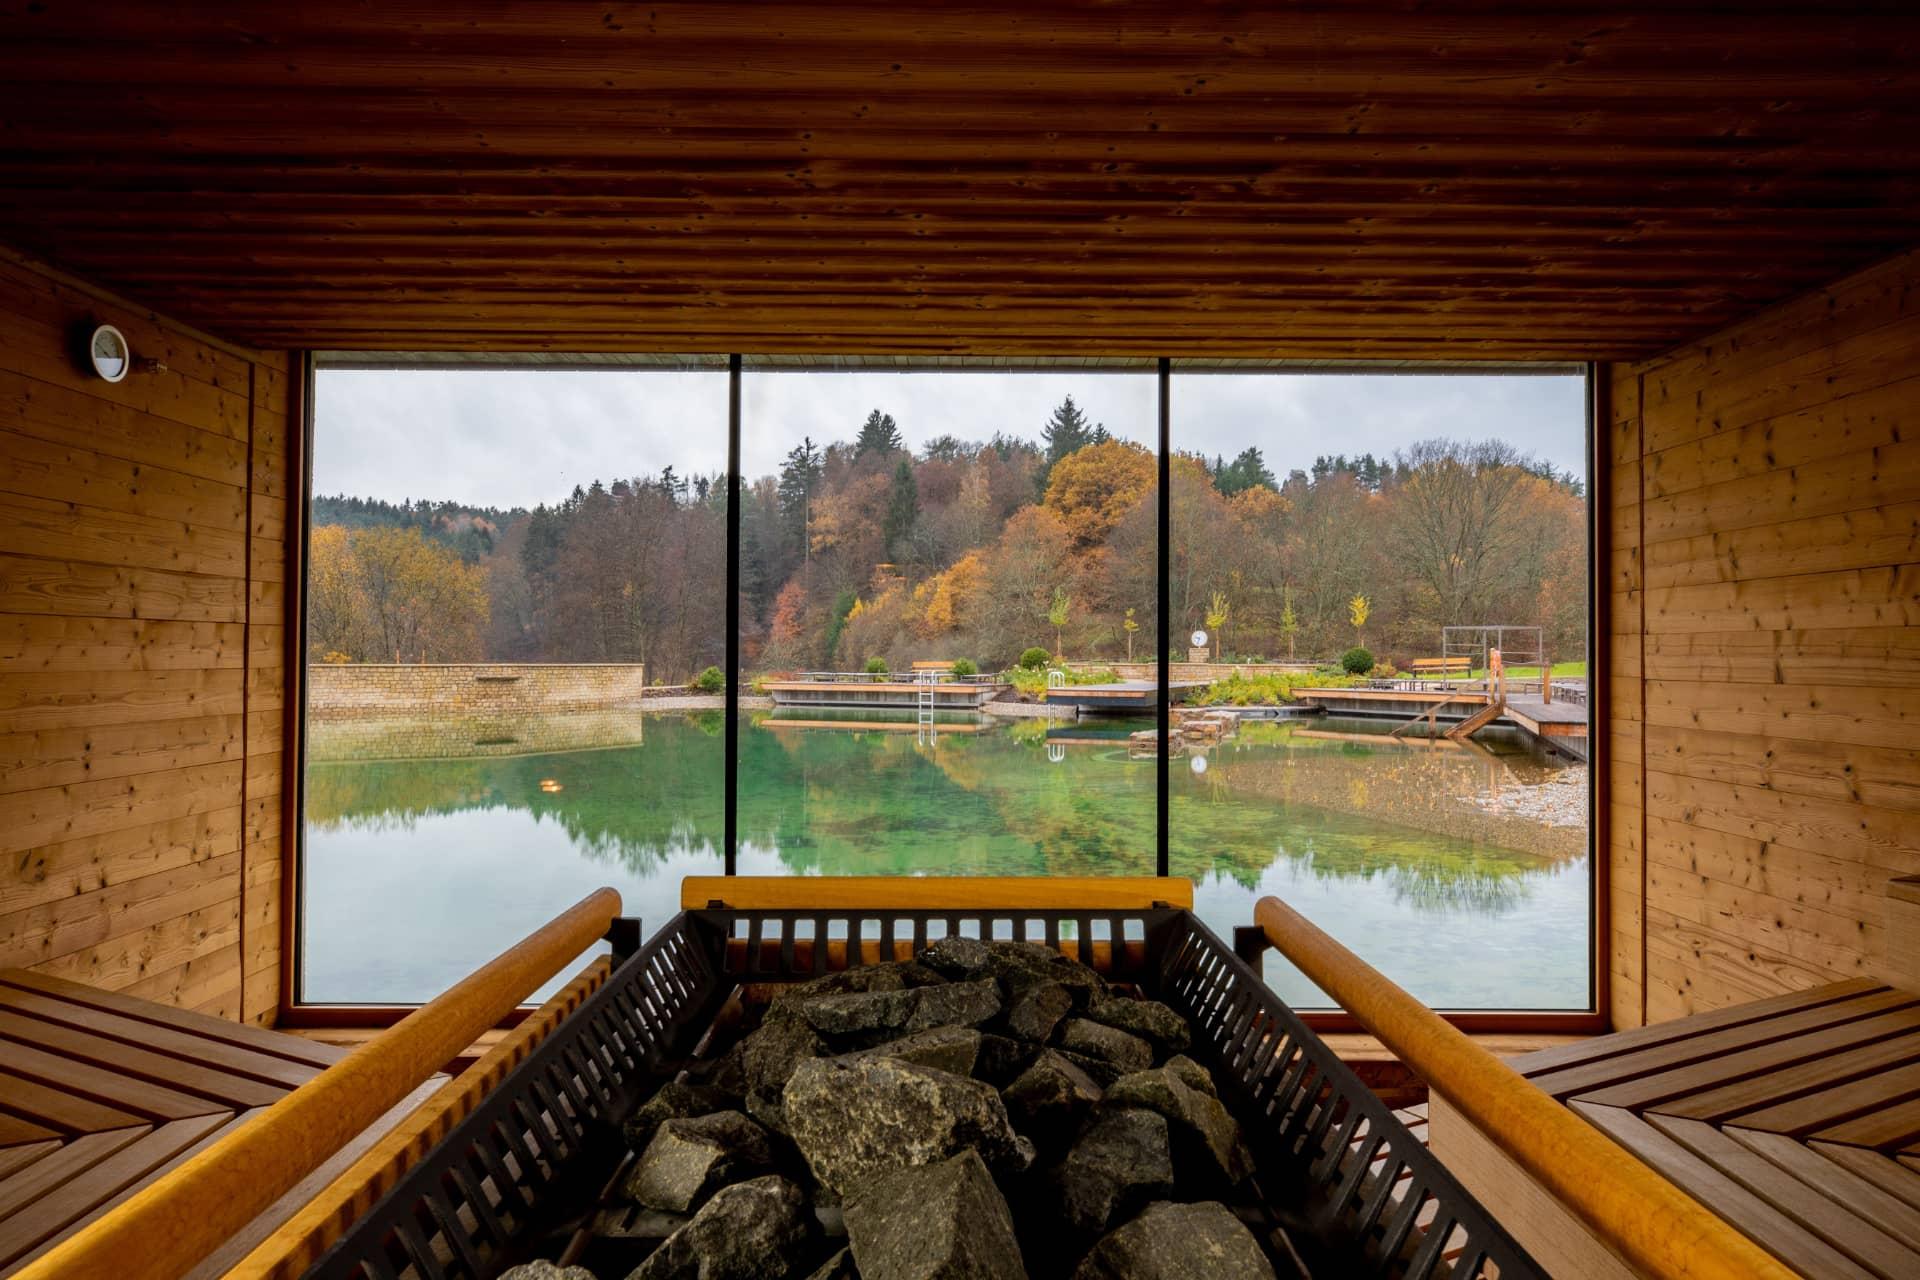 Fastenwandern Hotel Pfalzblick Sauna